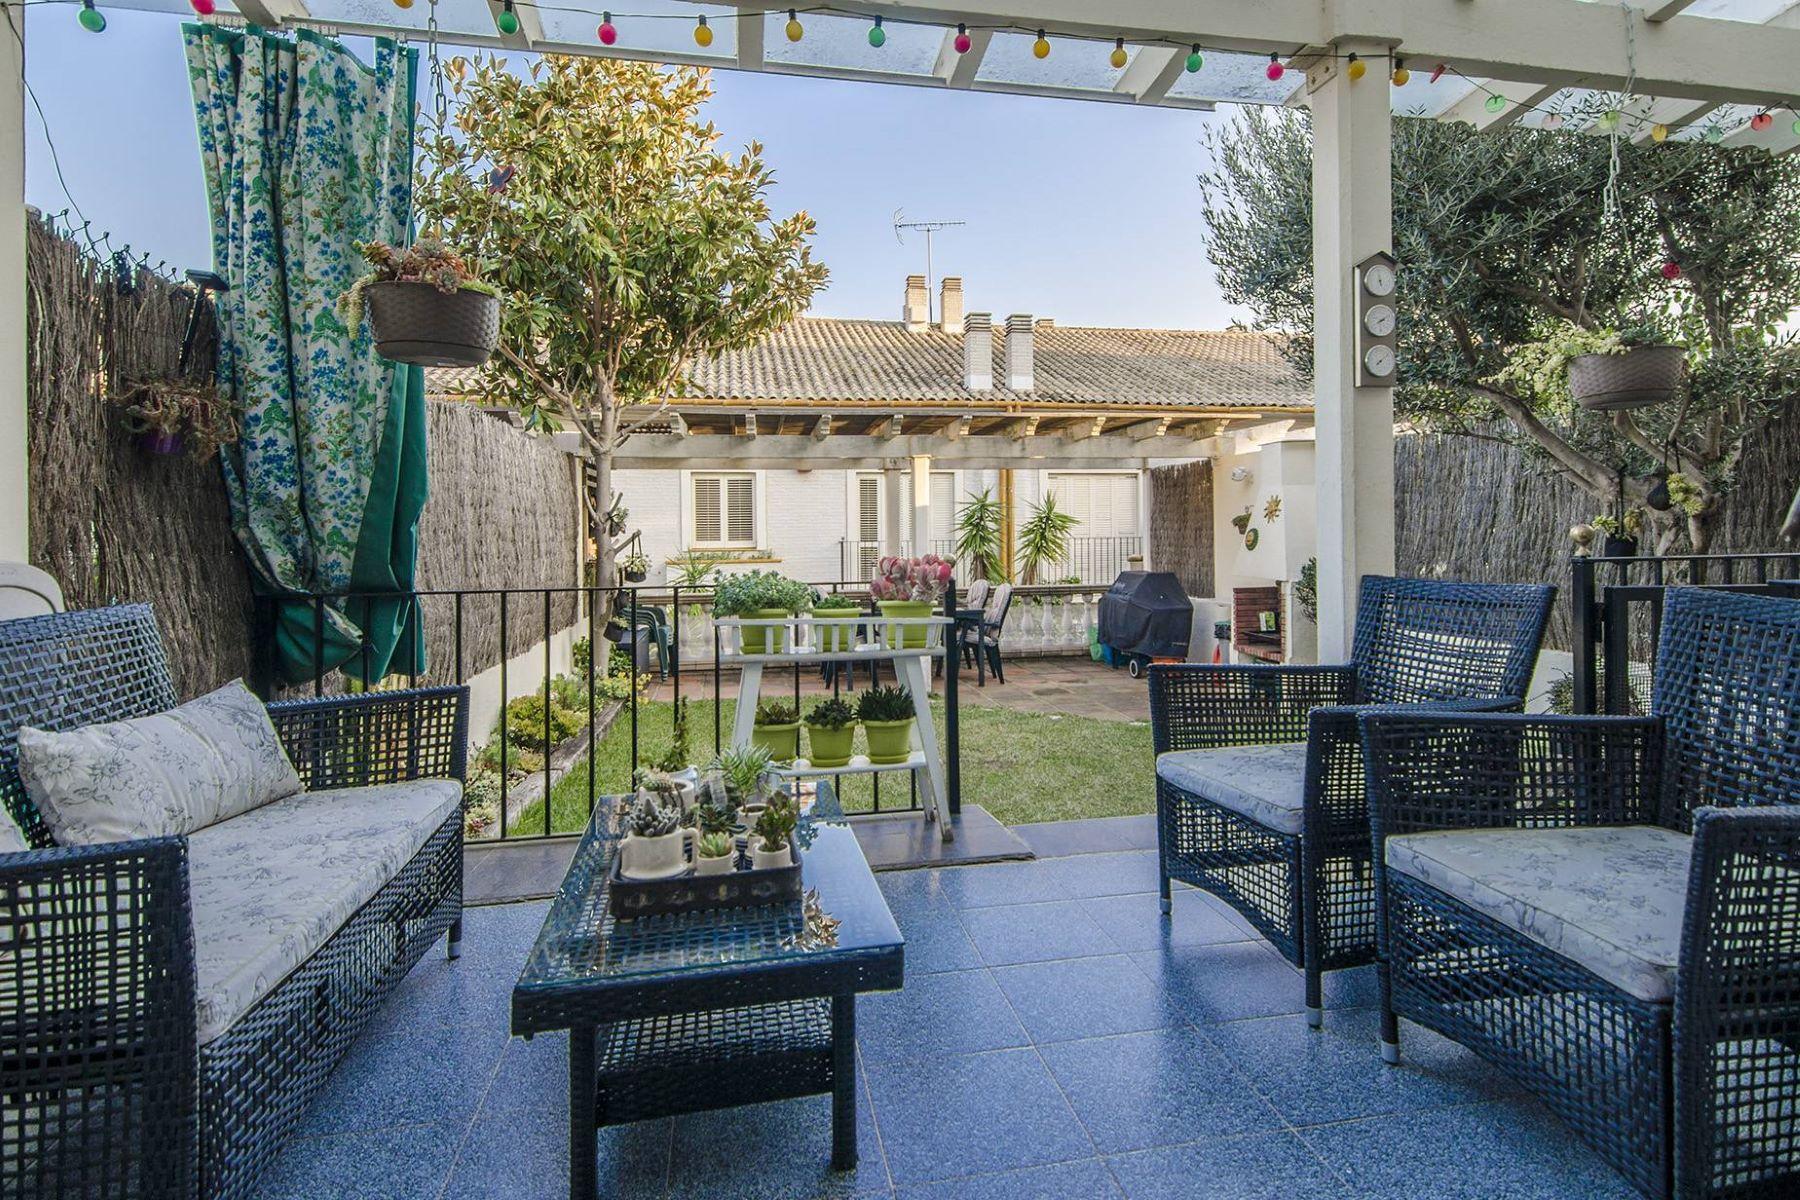 Casa Unifamiliar por un Venta en Semi-Detached House in Premià de Dalt Vilassar De Mar, Barcelona, 08340 España